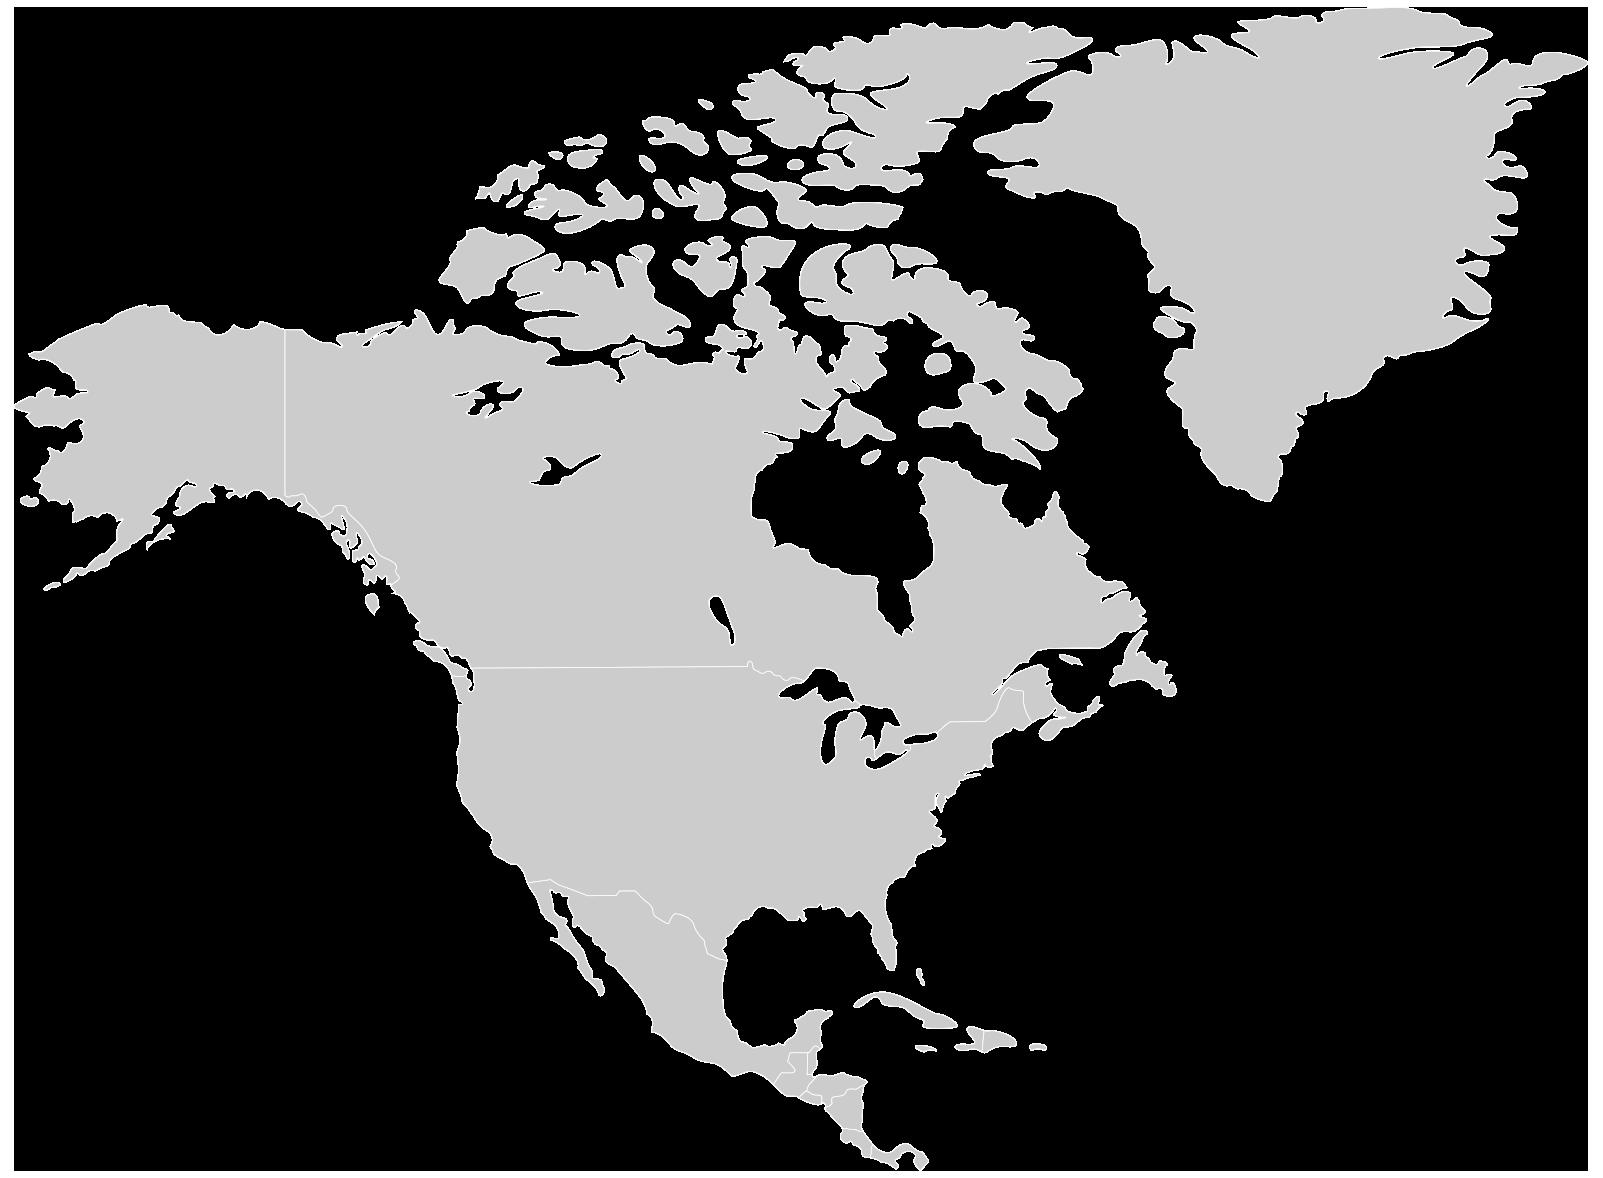 Herzog Karte Standorte Nordamerika